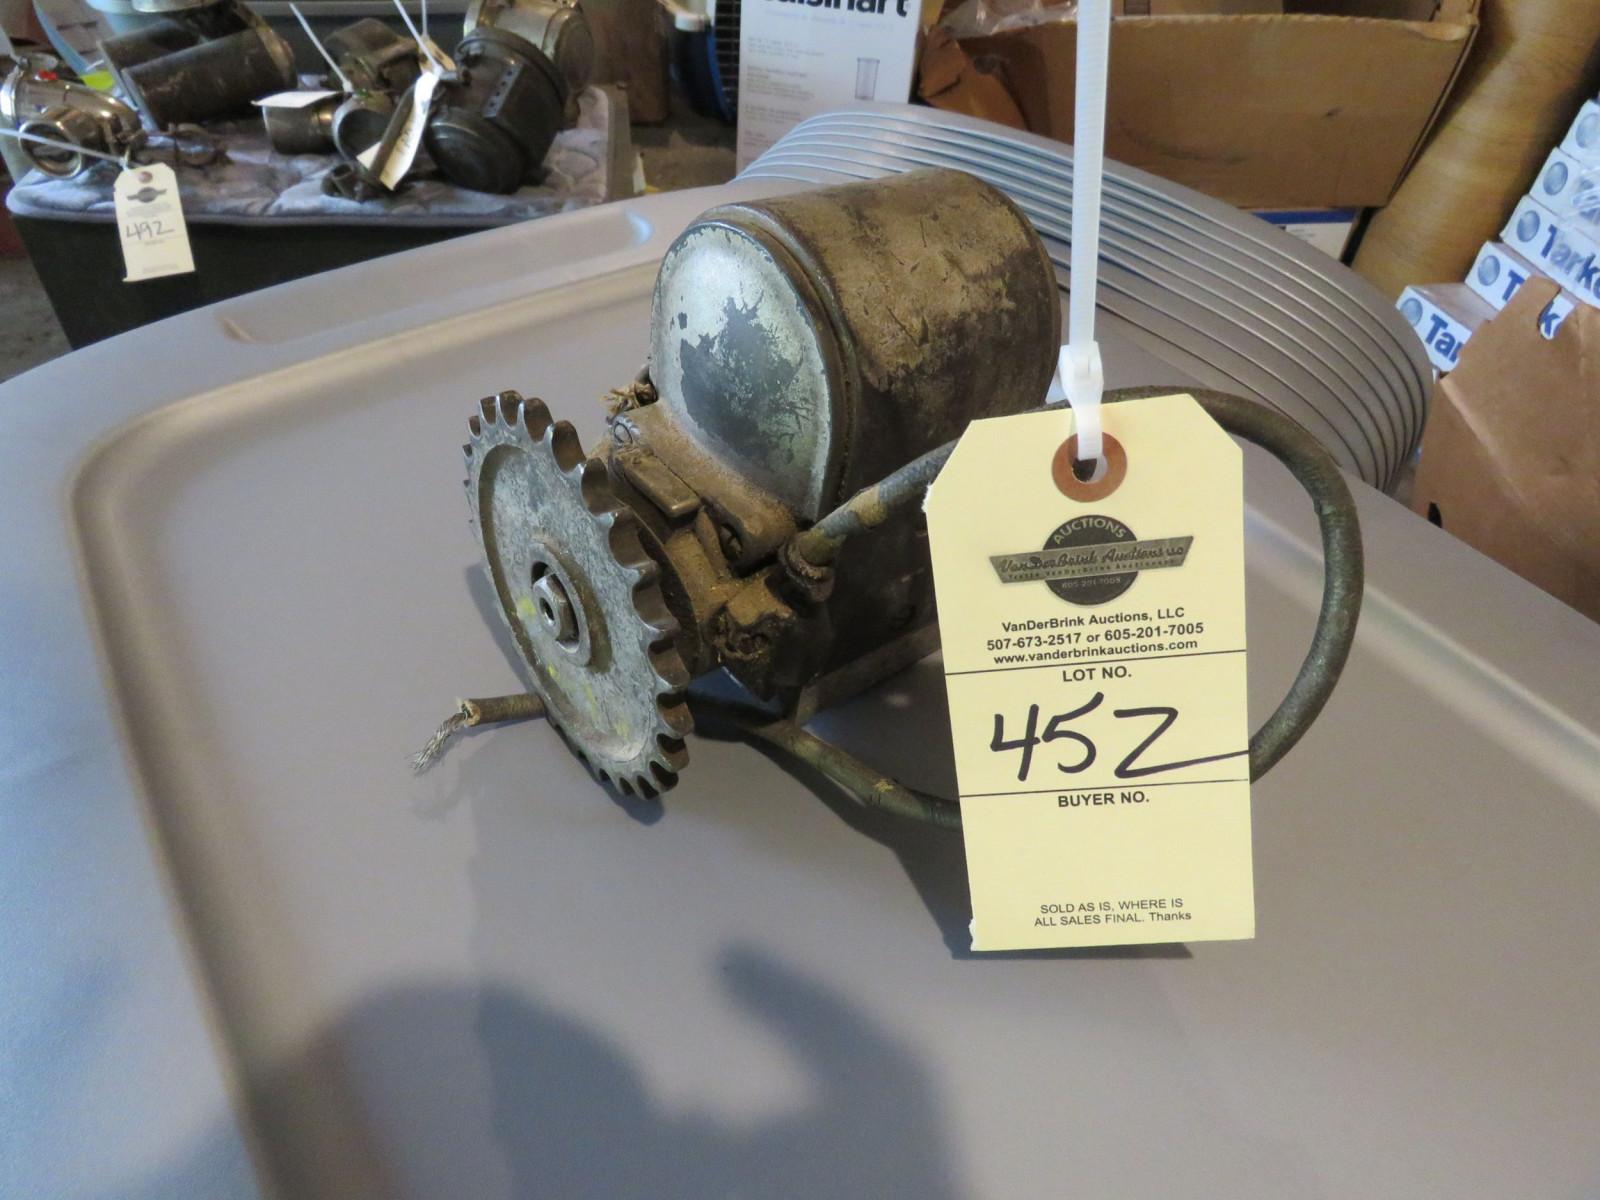 Lot 45Z – Bosch Motorcycle Magneto   VanderBrink Auctions